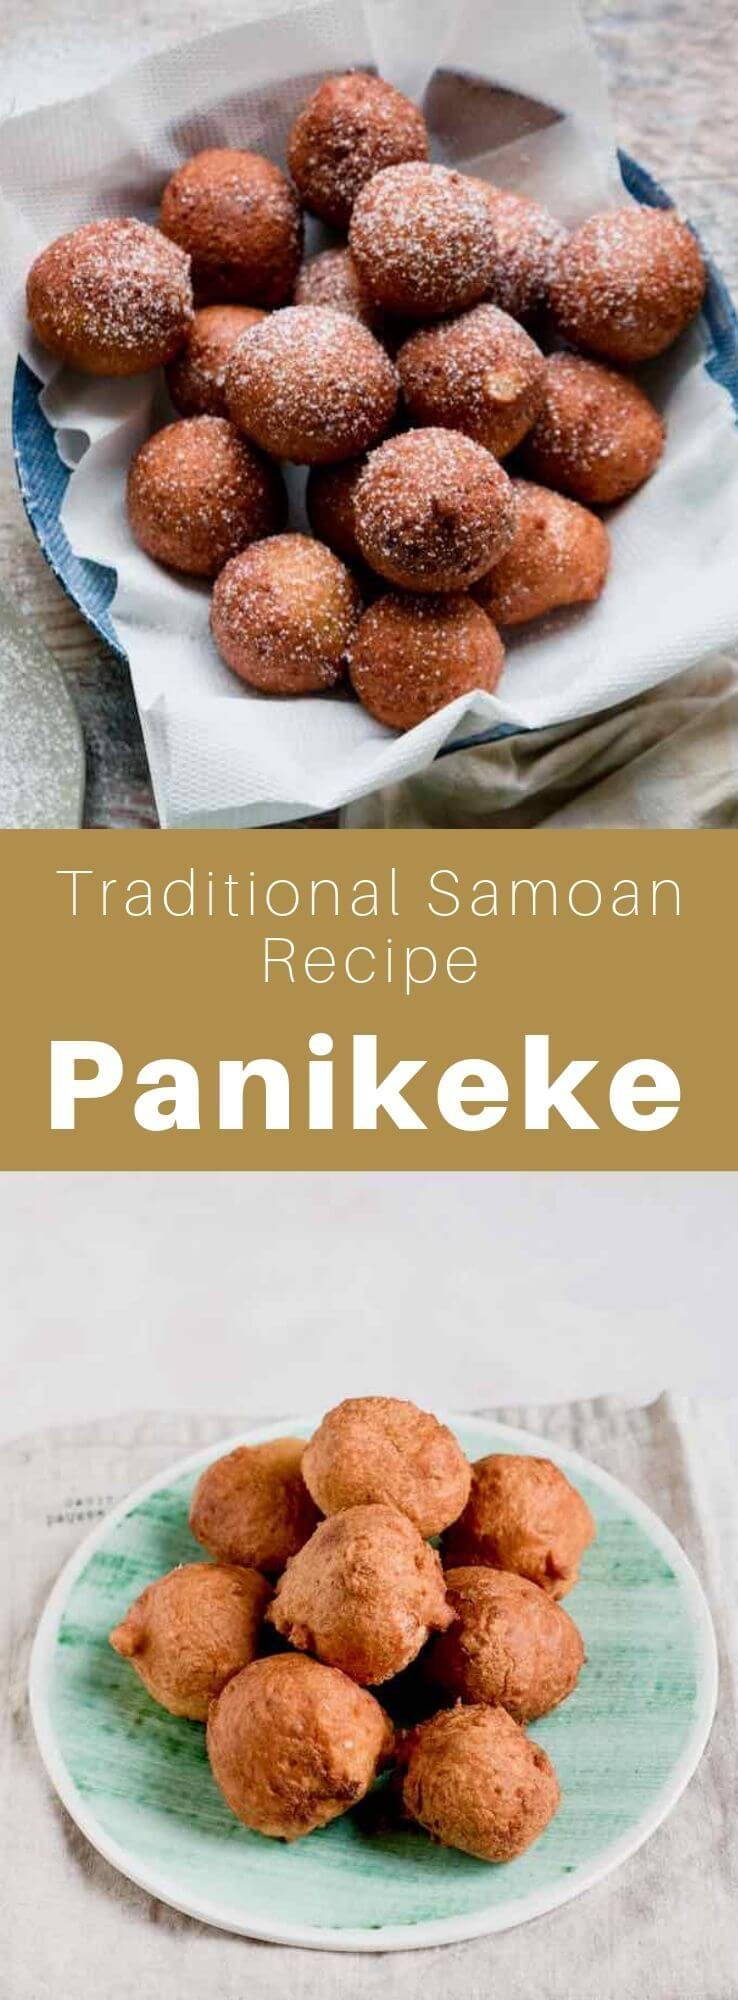 Panikeke, also called lapotopoto, keke isite, or tama is a delicious sweet, traditional donut from Samoa, Tonga and Palau. #Samoa #SamoanFood #SamoanCuisine #SamoanRecipe #Tonga #Palau #WorldCuisine #196flavors